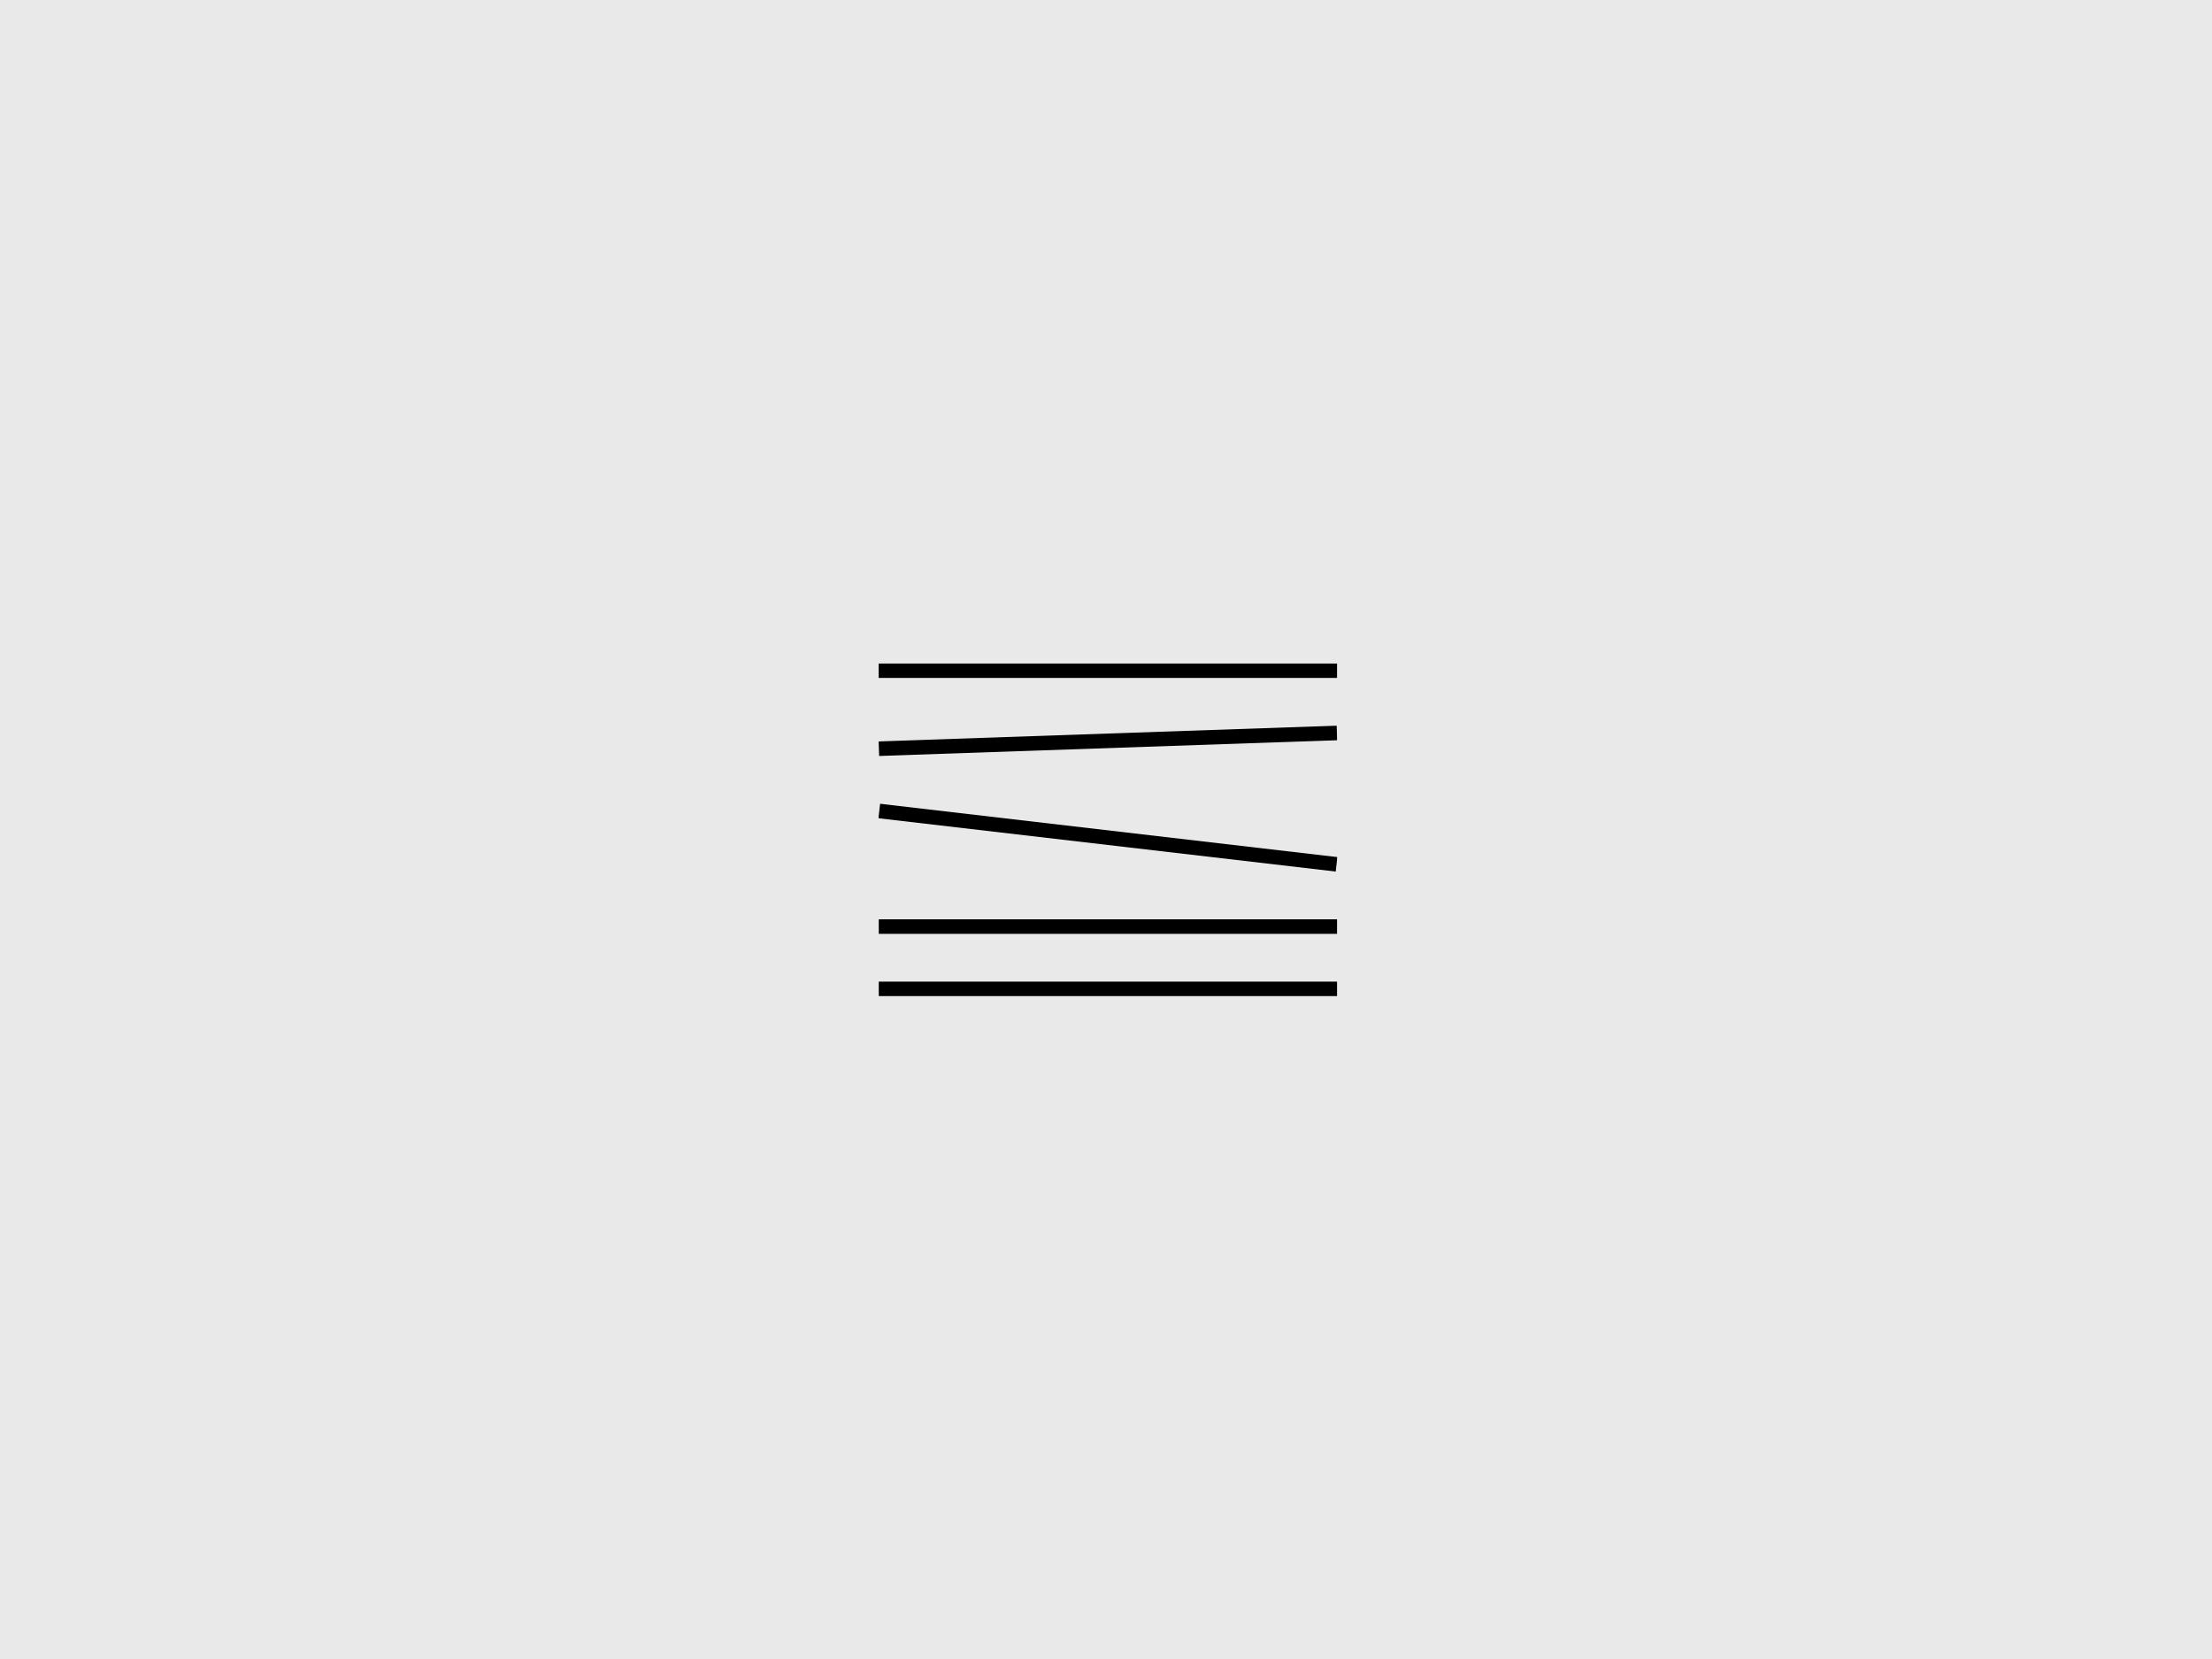 Contra Studio Graphic design Diseño gráfico Disseny gràfic Barcelona Terrassa Branding Imatge corporativa Imagen corporativa Identidad visual Tarjetas corporativas Logo Logotipo Publicitat Marketing